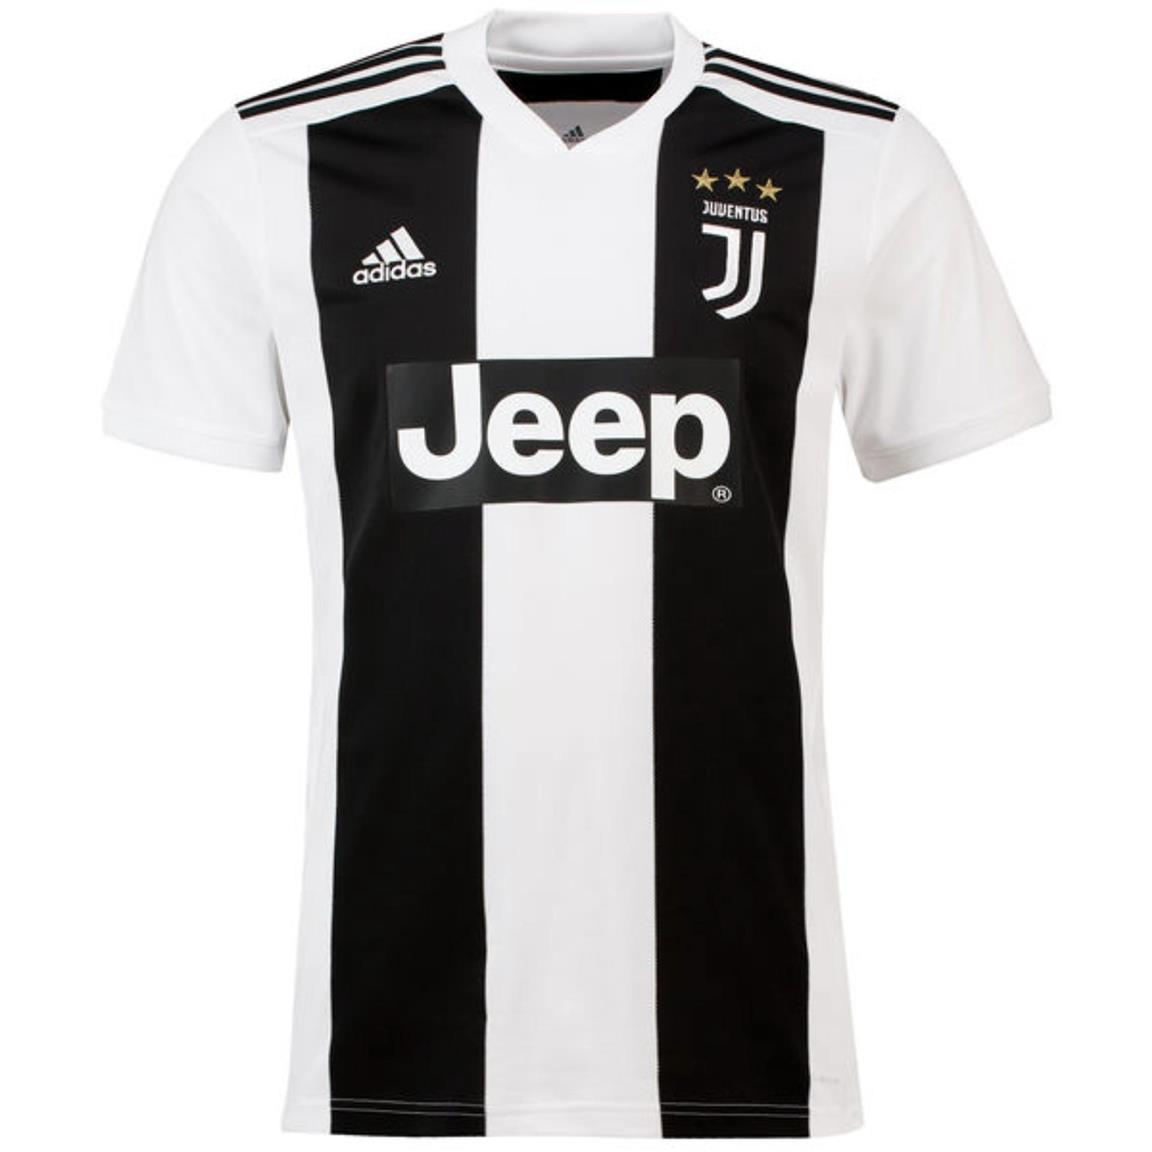 Juventus Football Jersey Home Kit 2018-2019 Adidas 2018 19. ‹ › 5e6279be9